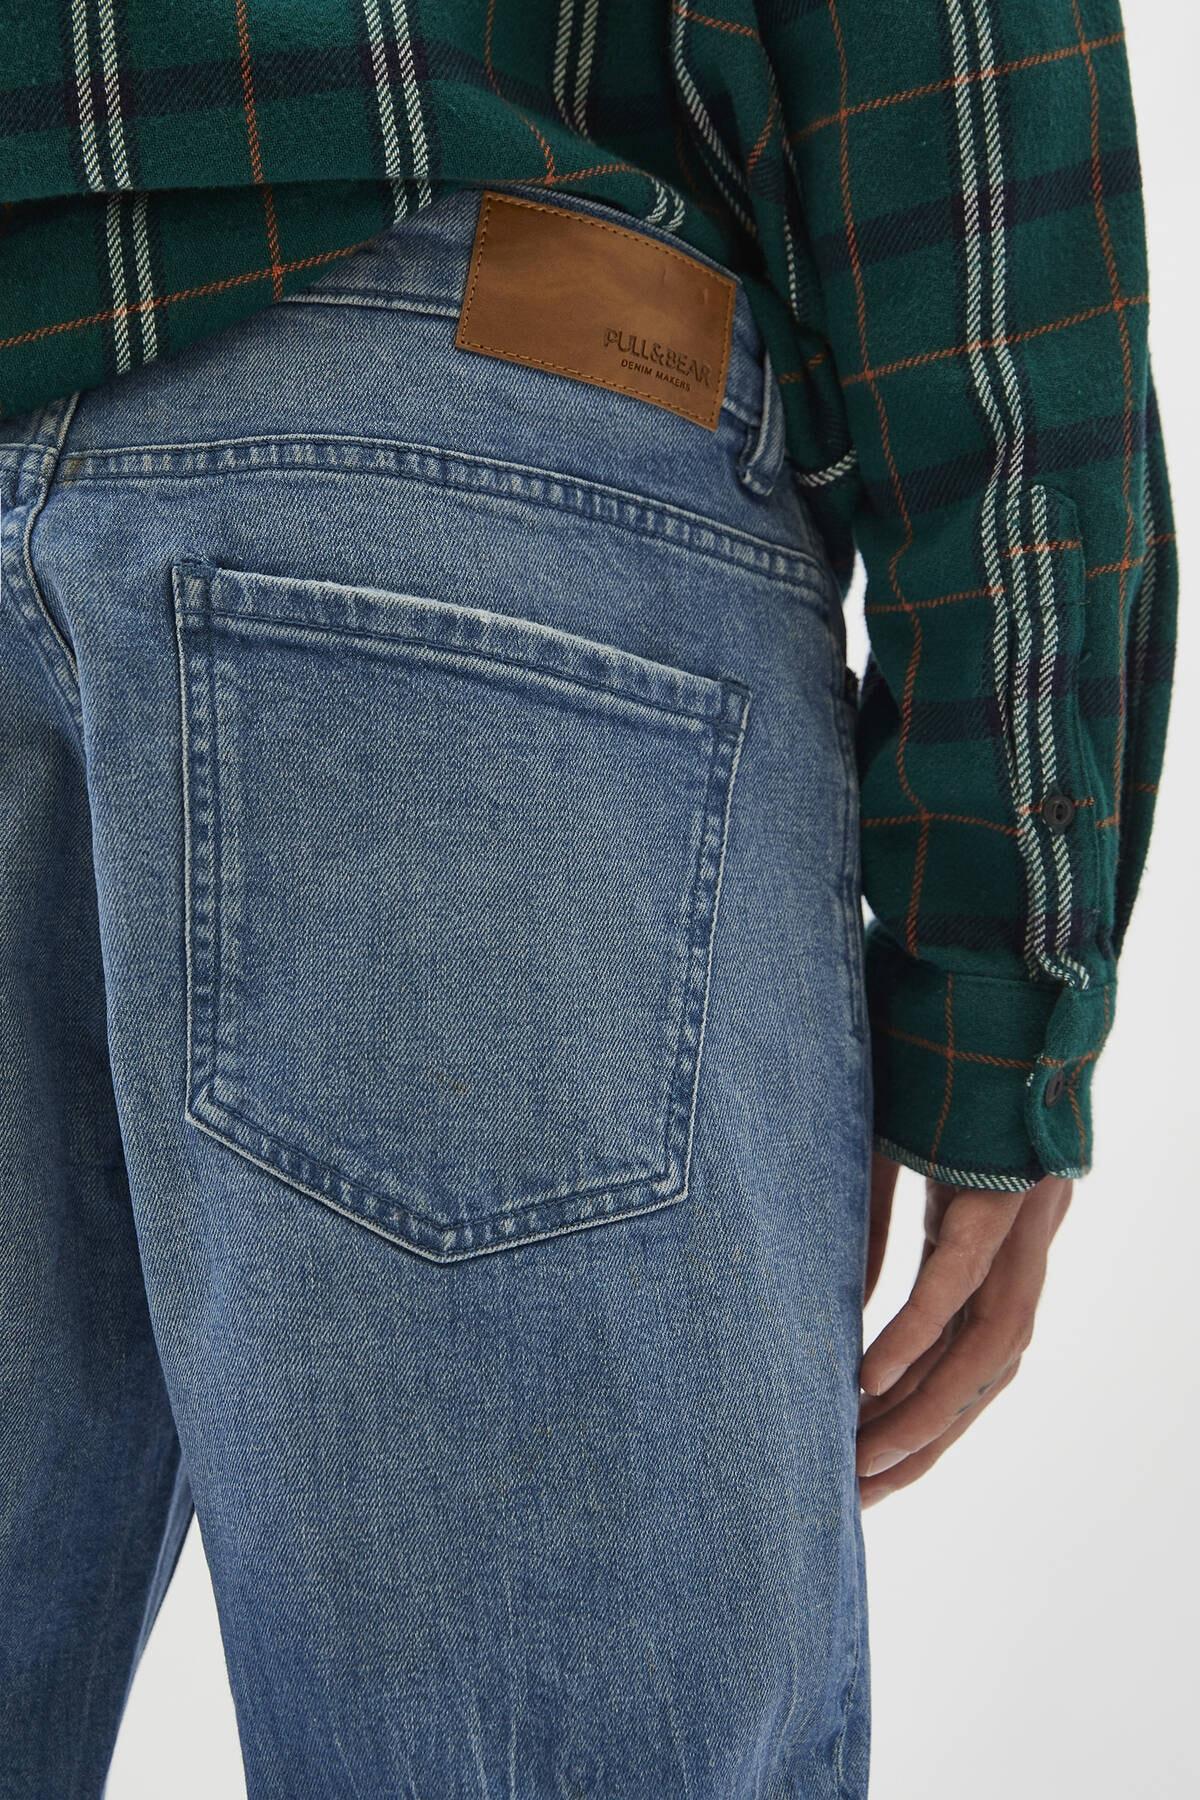 Pull & Bear Erkek Yeşilimsi Mavi Comfort Slim Fit Jean 04681504 1